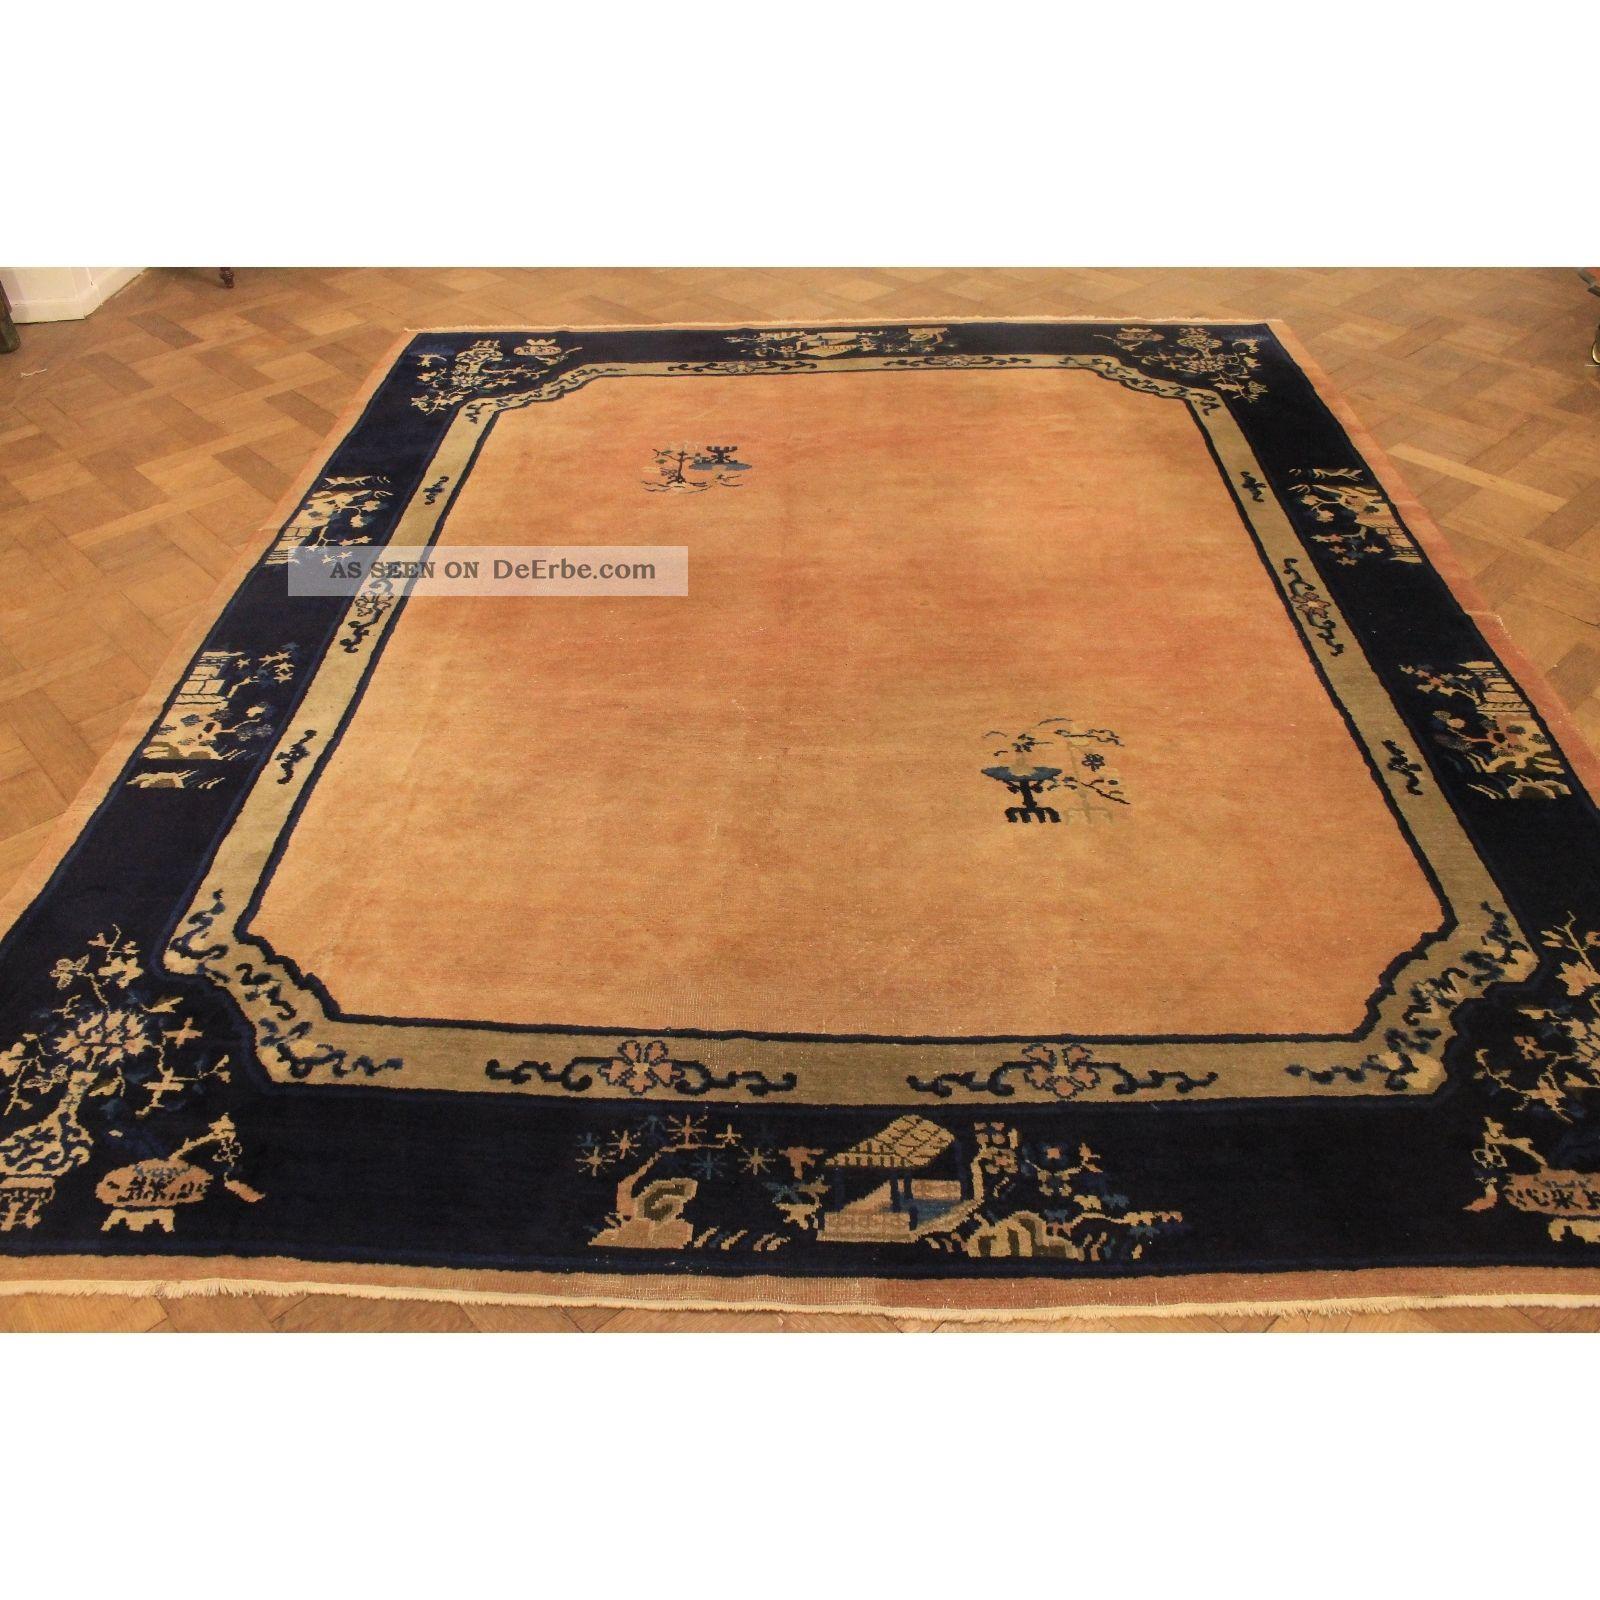 Wundersch ner antiker handgekn pfter china art deco orient - Art deco teppich ...